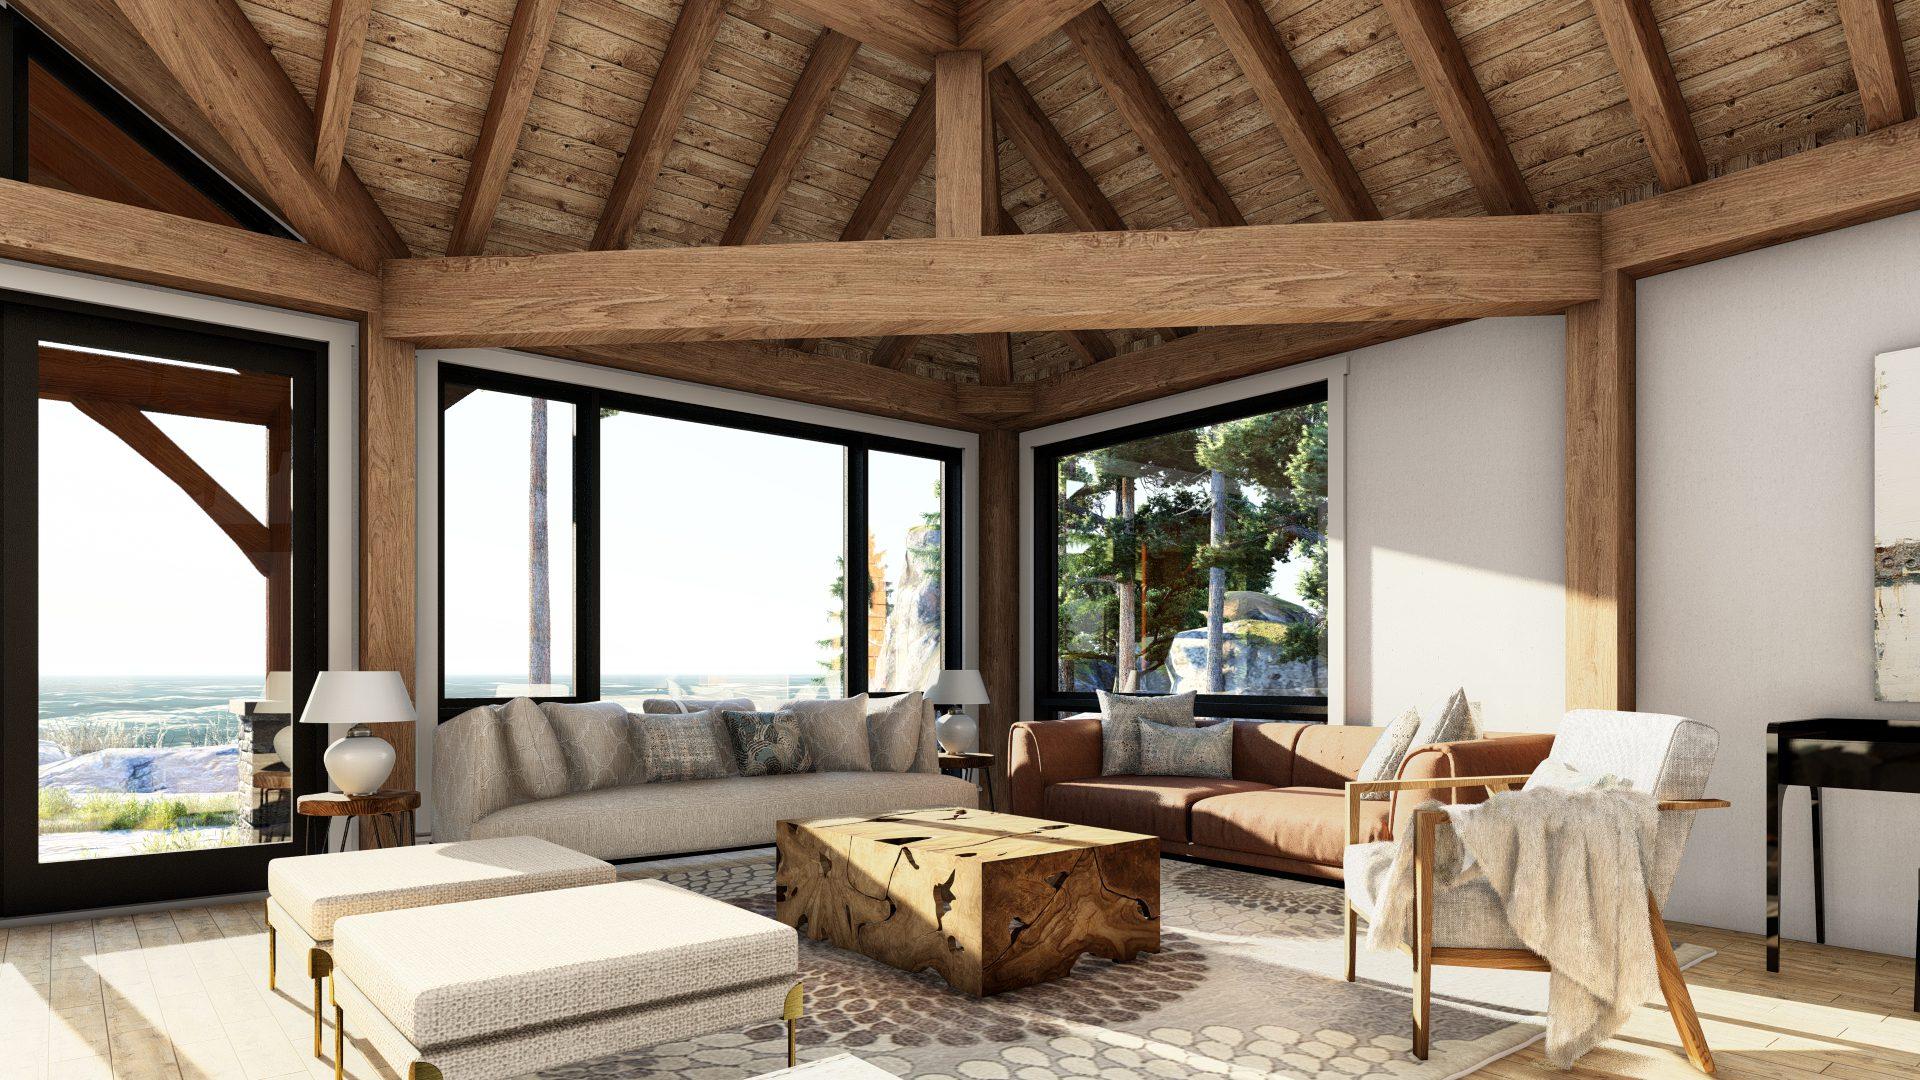 Normerica Timber Frames, House Plan, The Britt 3954, Interior, Living Room